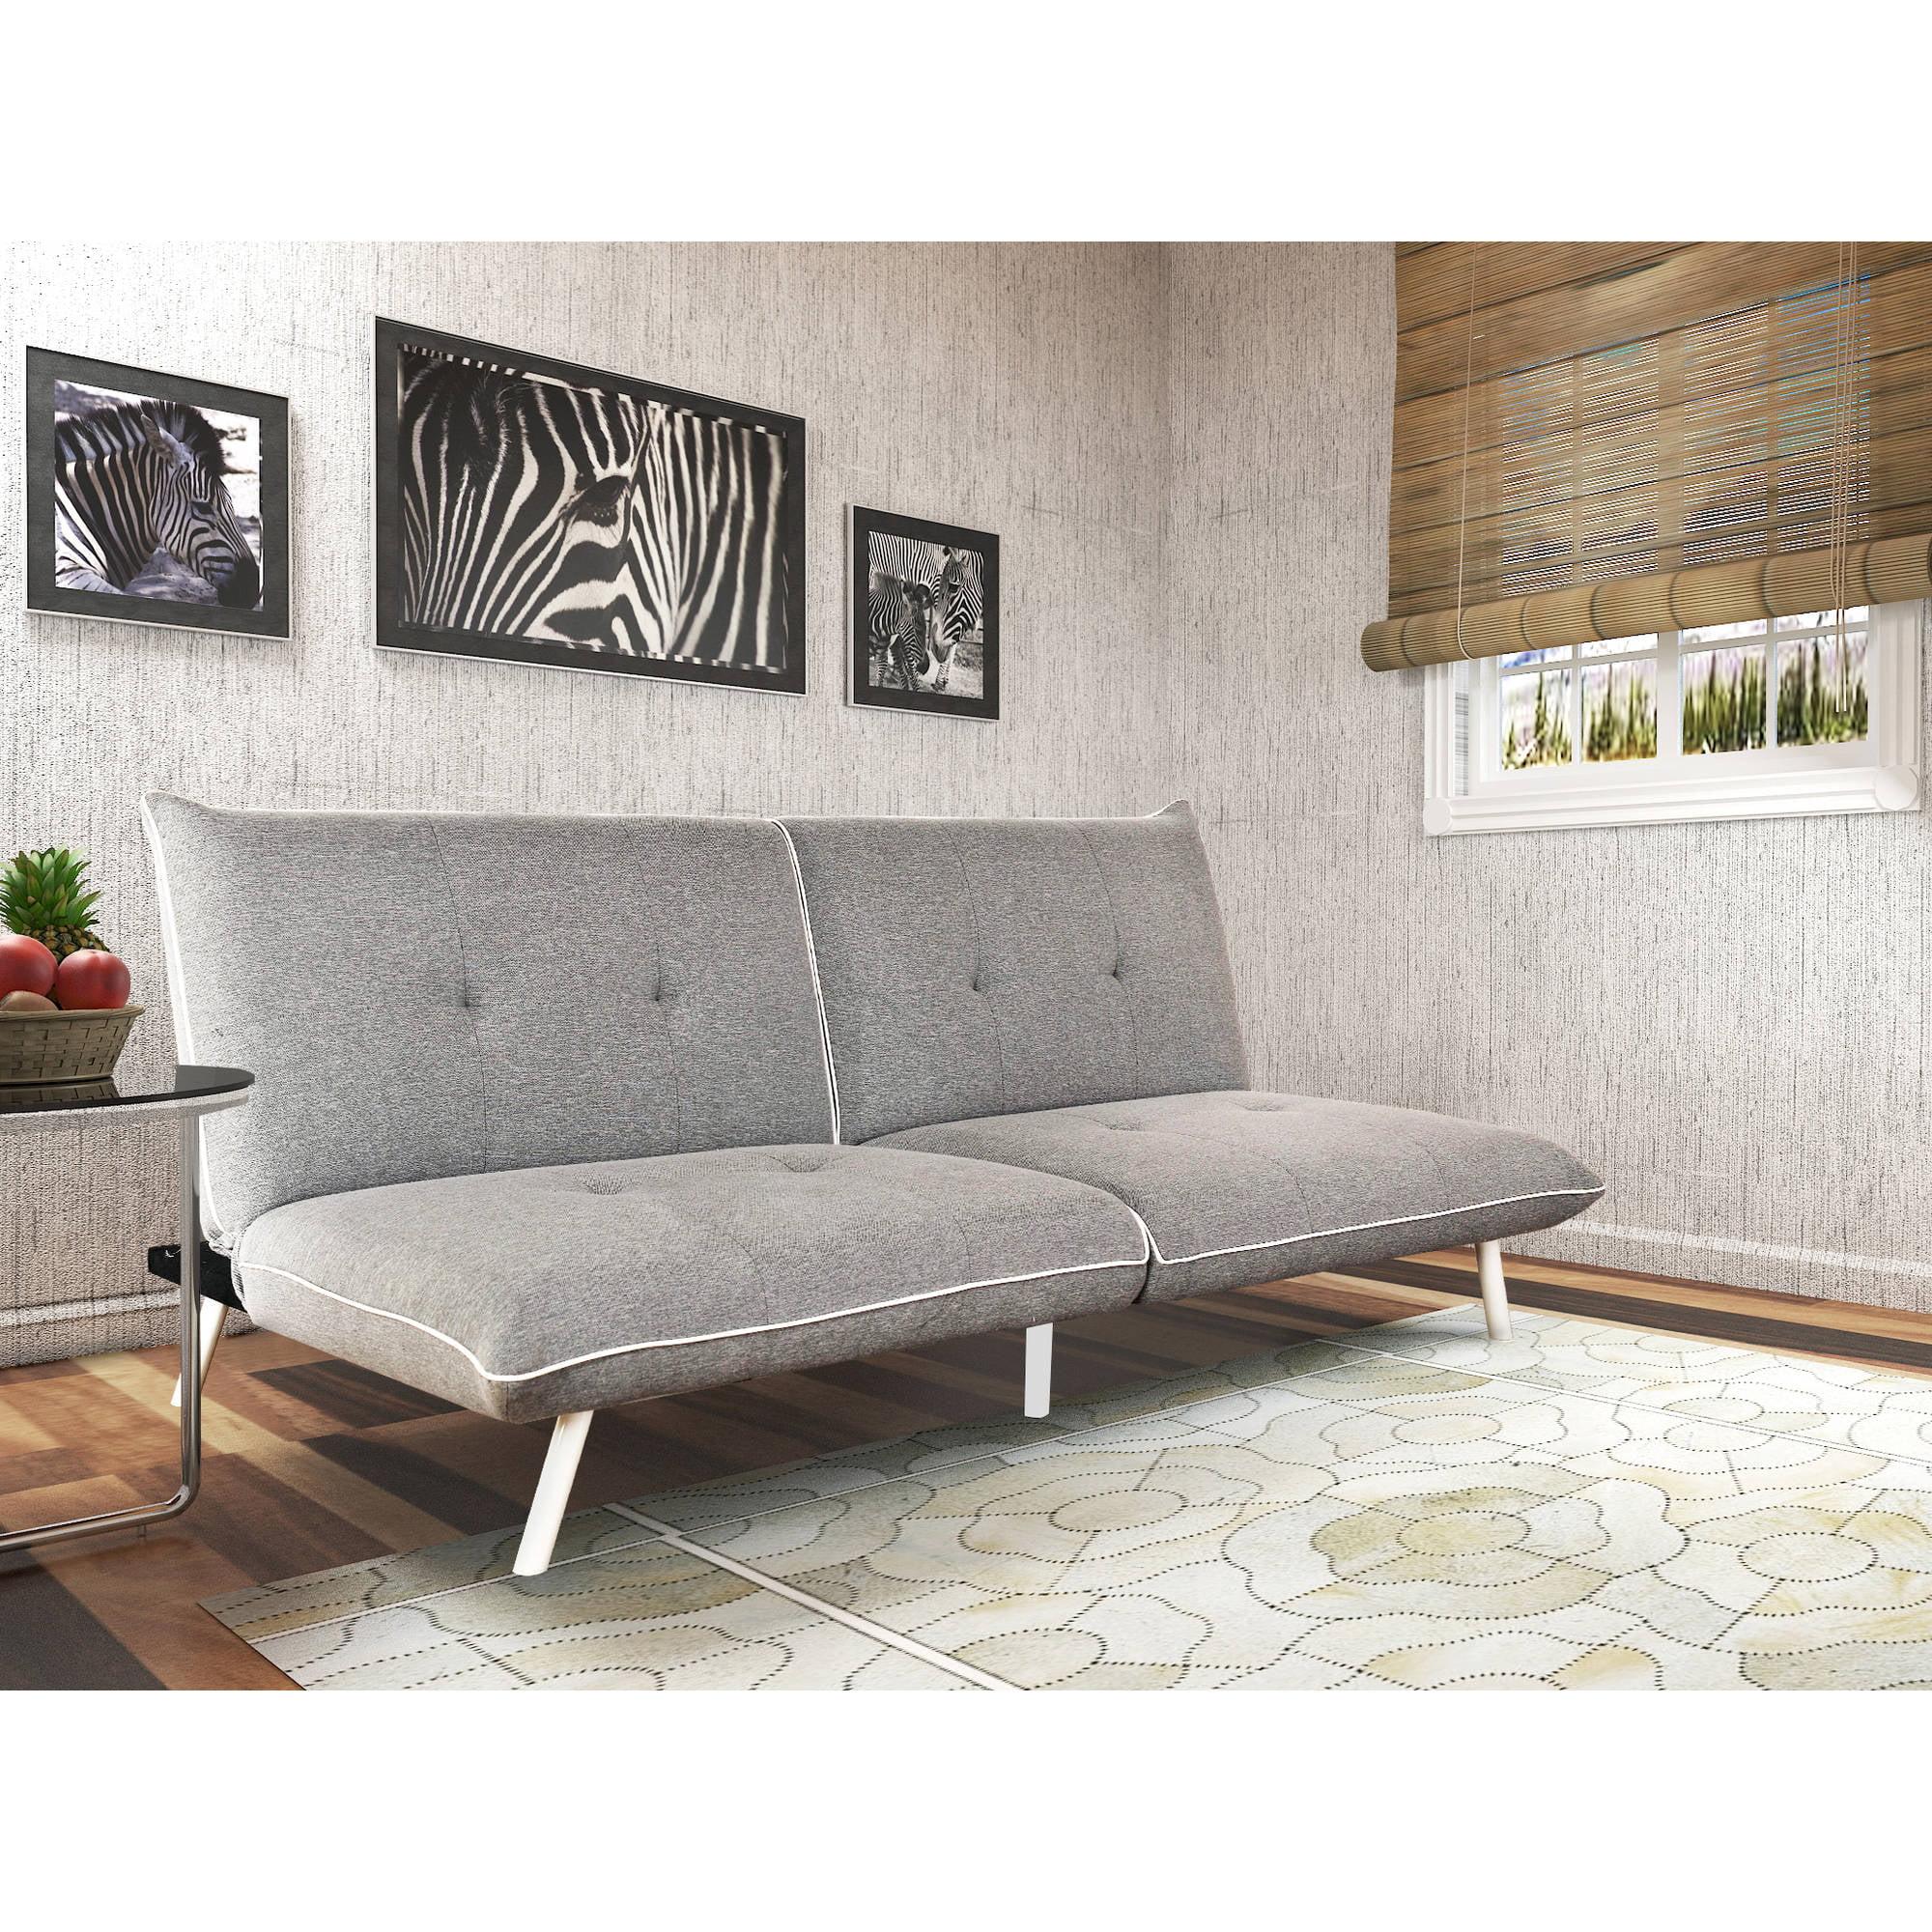 extra long sofa bed reclining reviews 2017 futon